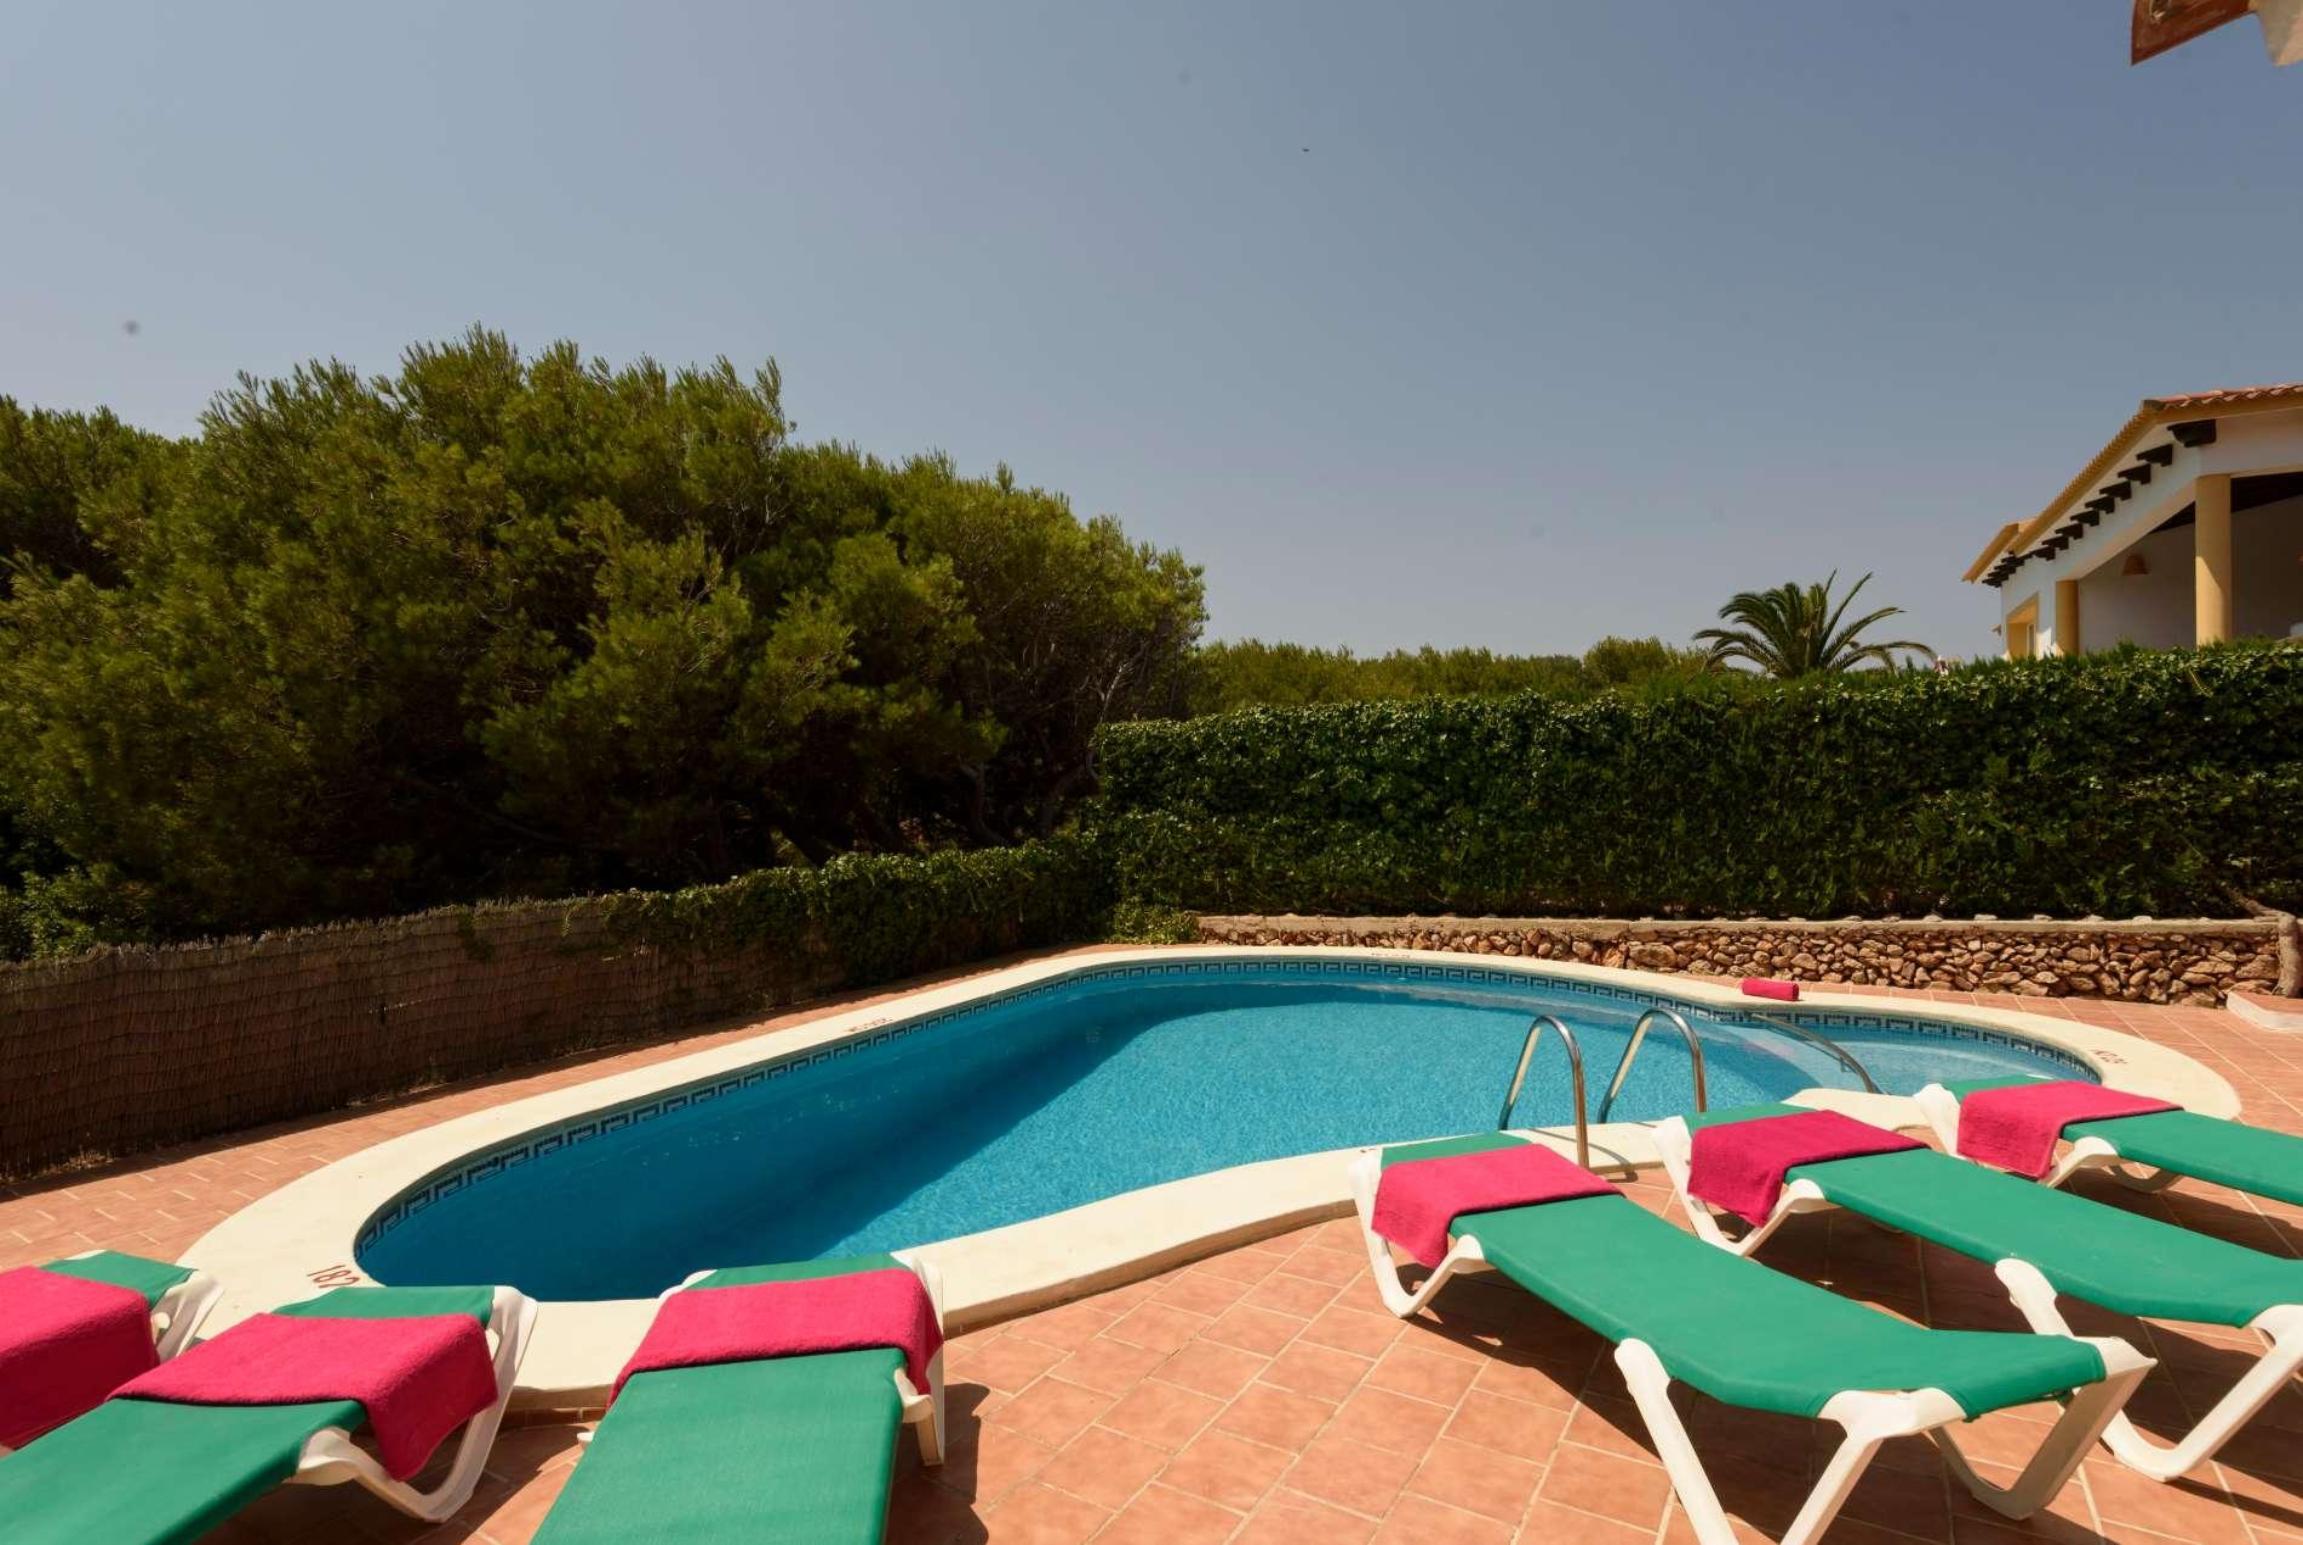 Ferienhaus Eulalia II (2653368), Arenal De'N Castell, Menorca, Balearische Inseln, Spanien, Bild 21